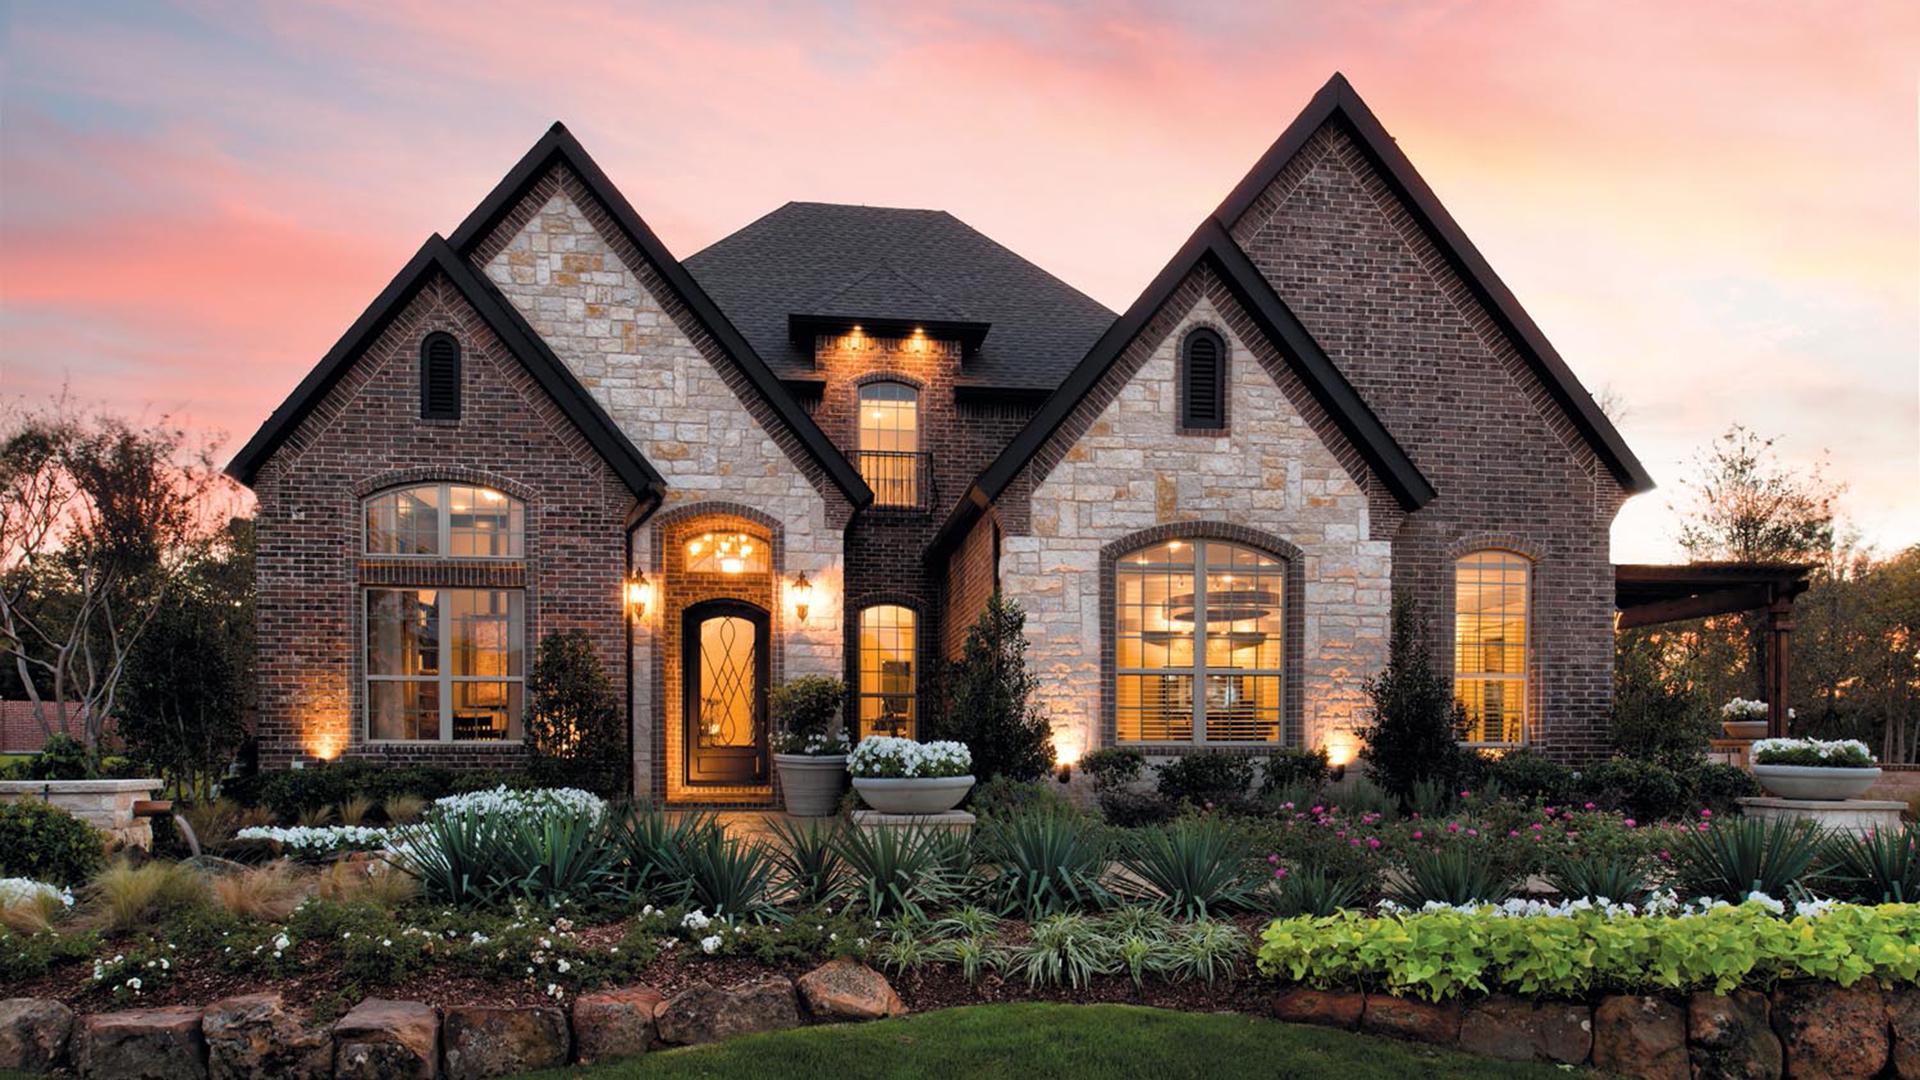 STNT_BERK_TX_3SPE_654_PHOTO_1_1920 Stanton Home Design on garrison home design, cobb home design, tranquility home design,